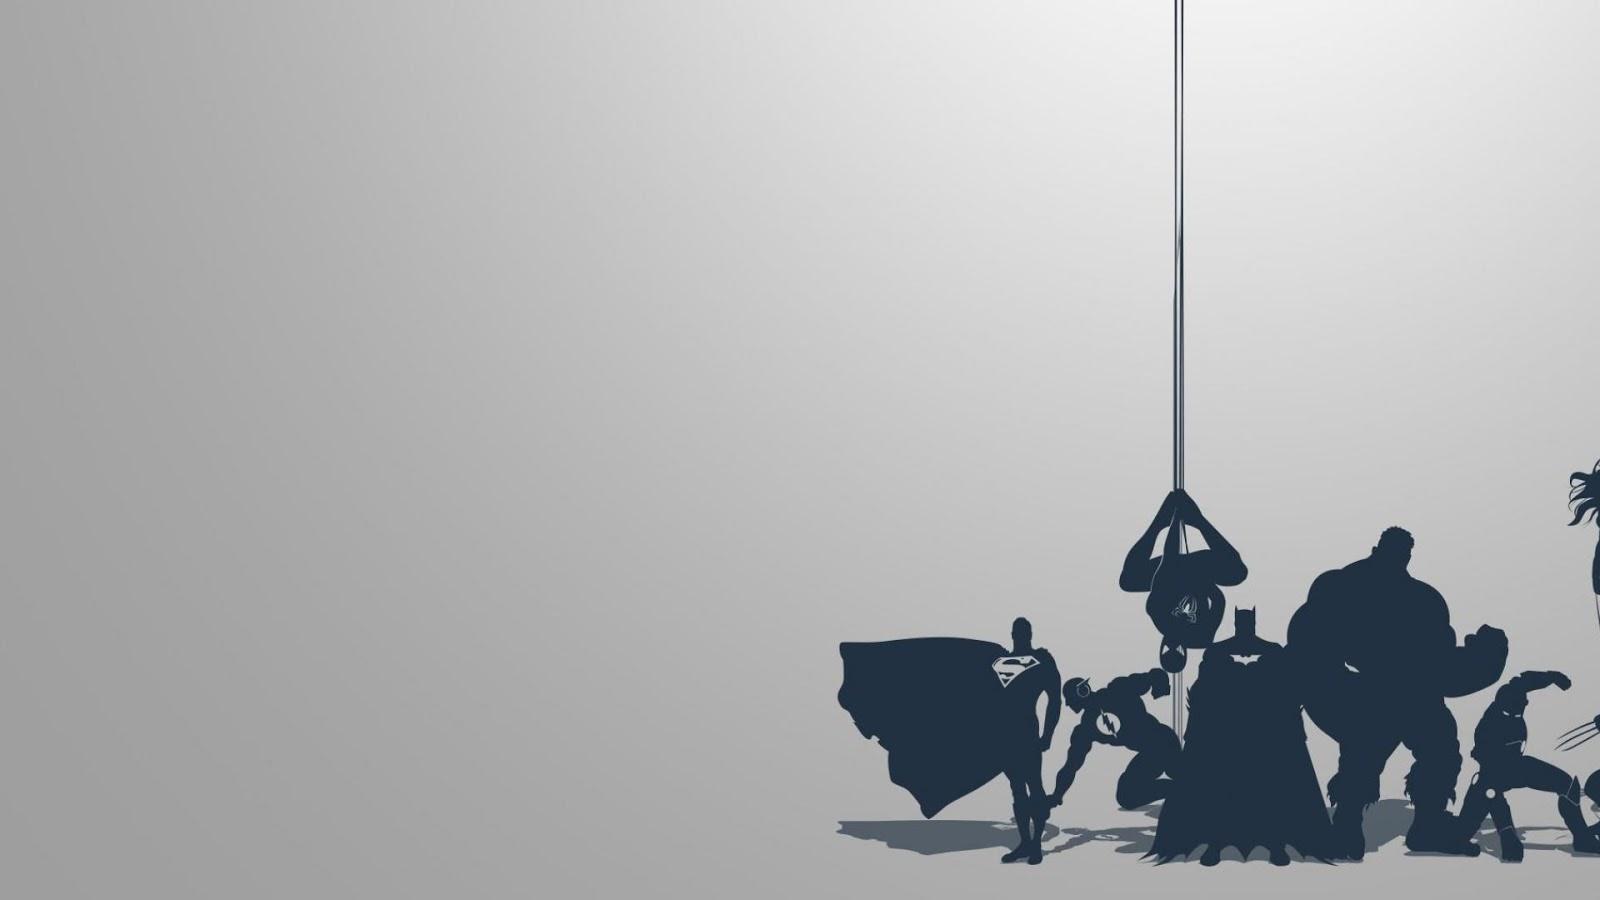 Post PICs of cool SUPERHERO wallpaper IGN Boards 1600x900